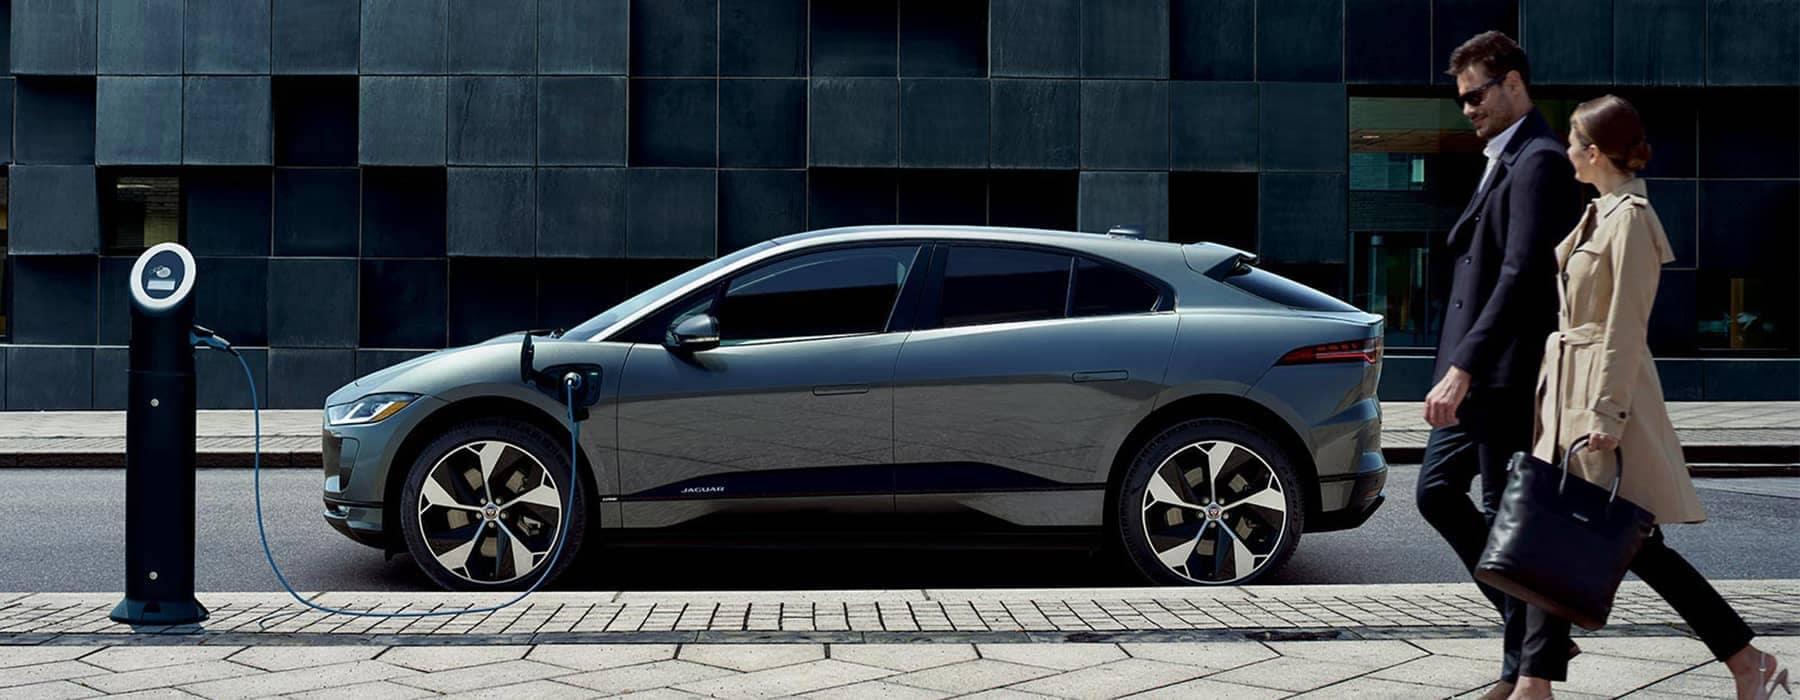 2019 Jaguar I-Pace Charging